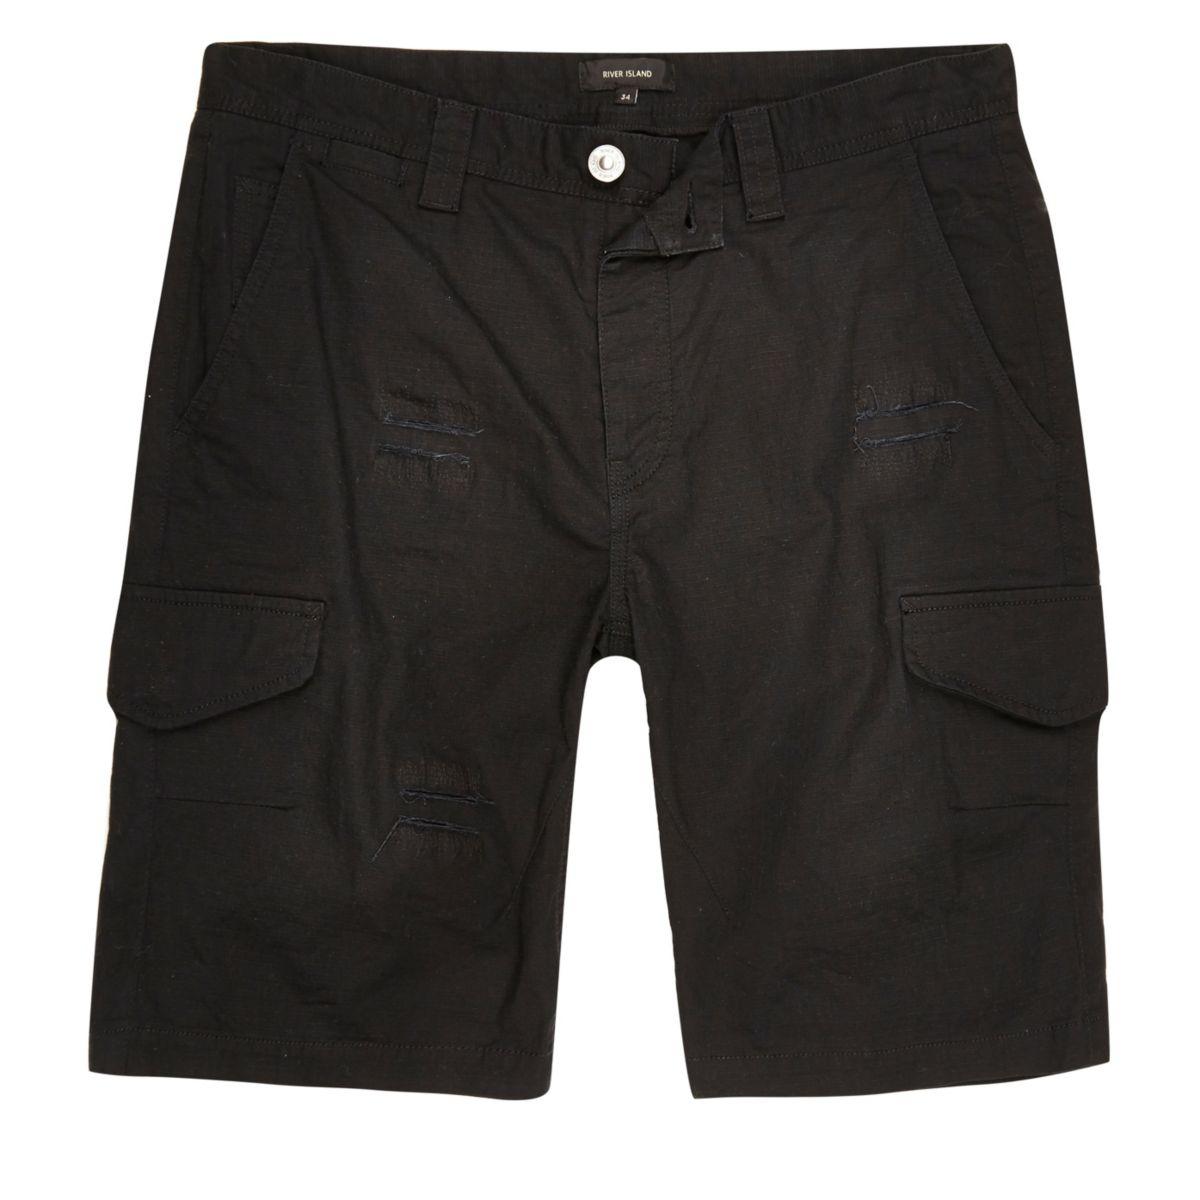 black slim fit distressed cargo shorts shorts sale men